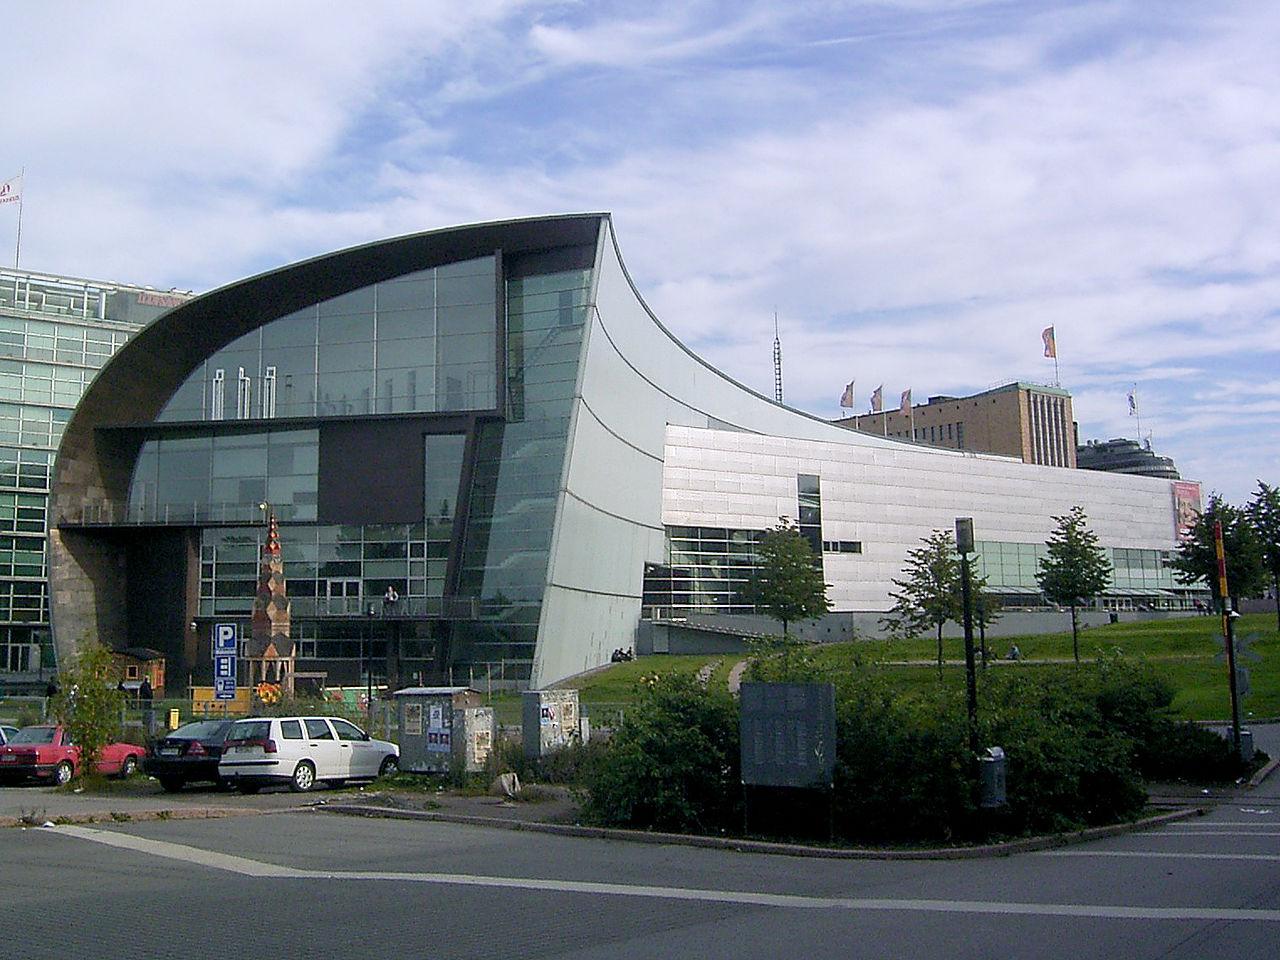 Muzeul de arta contemporana Kiasma